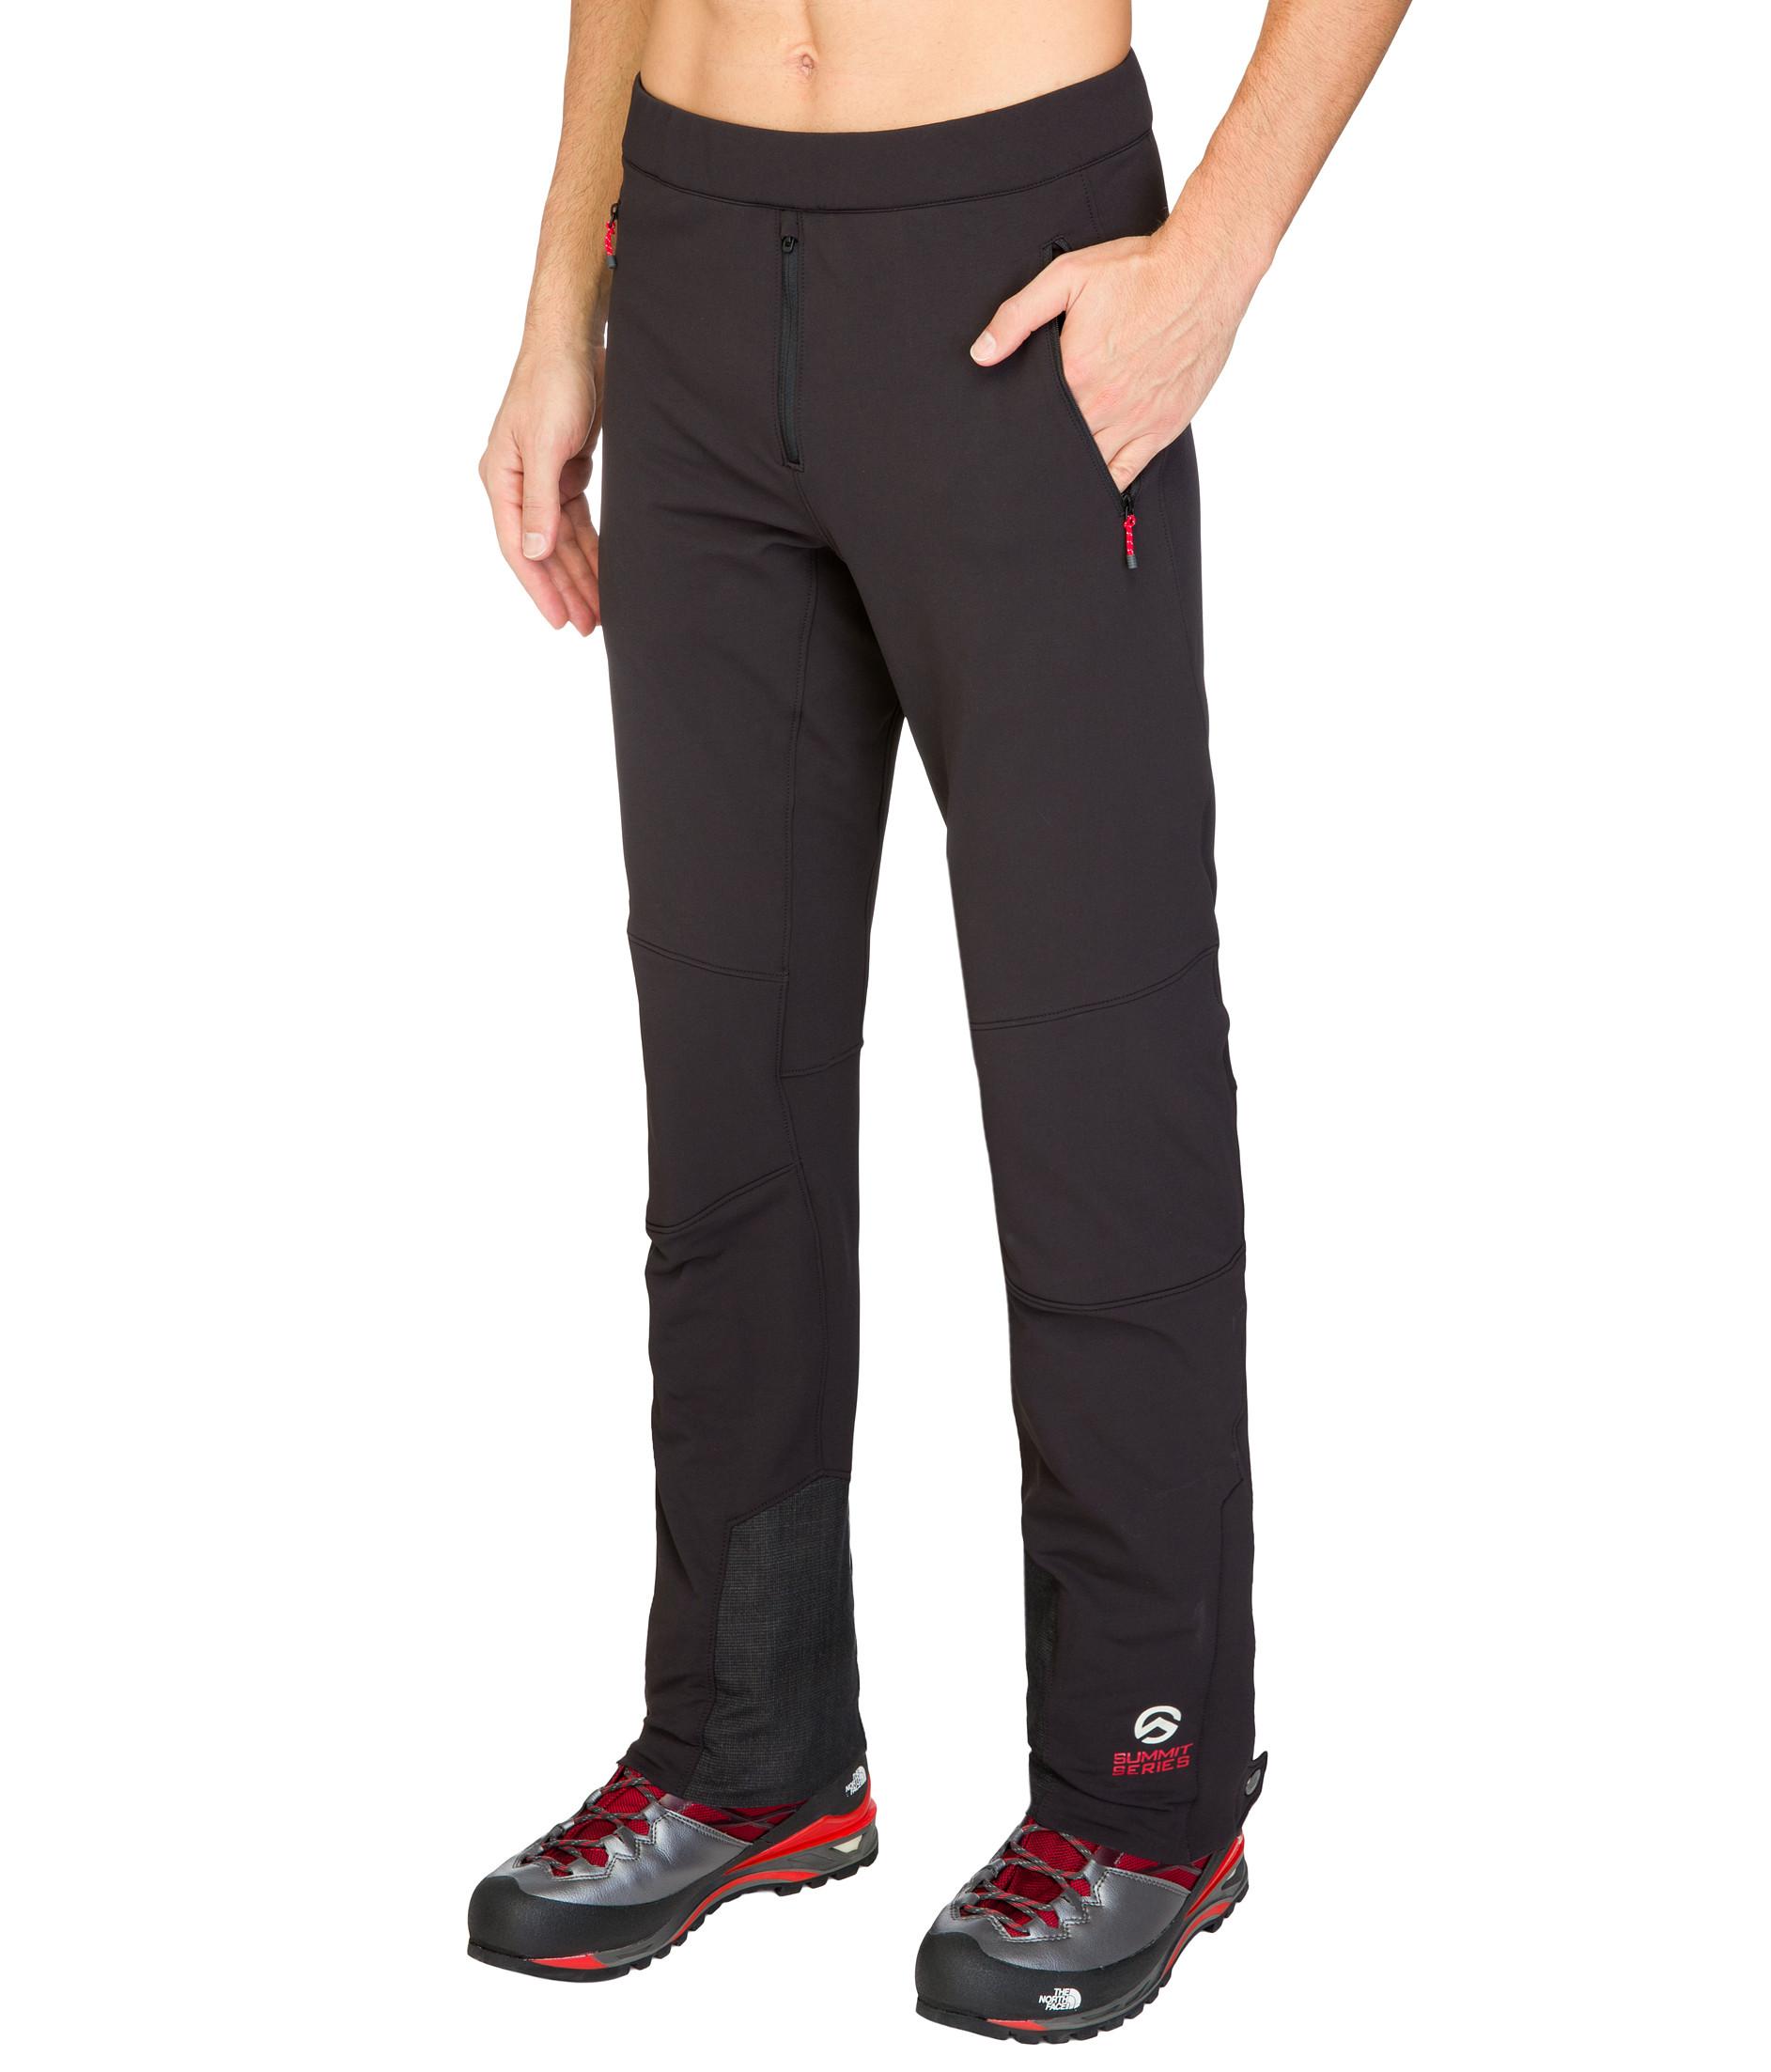 Spodnie Apex Orion tnf black,tnfblack/tnf red